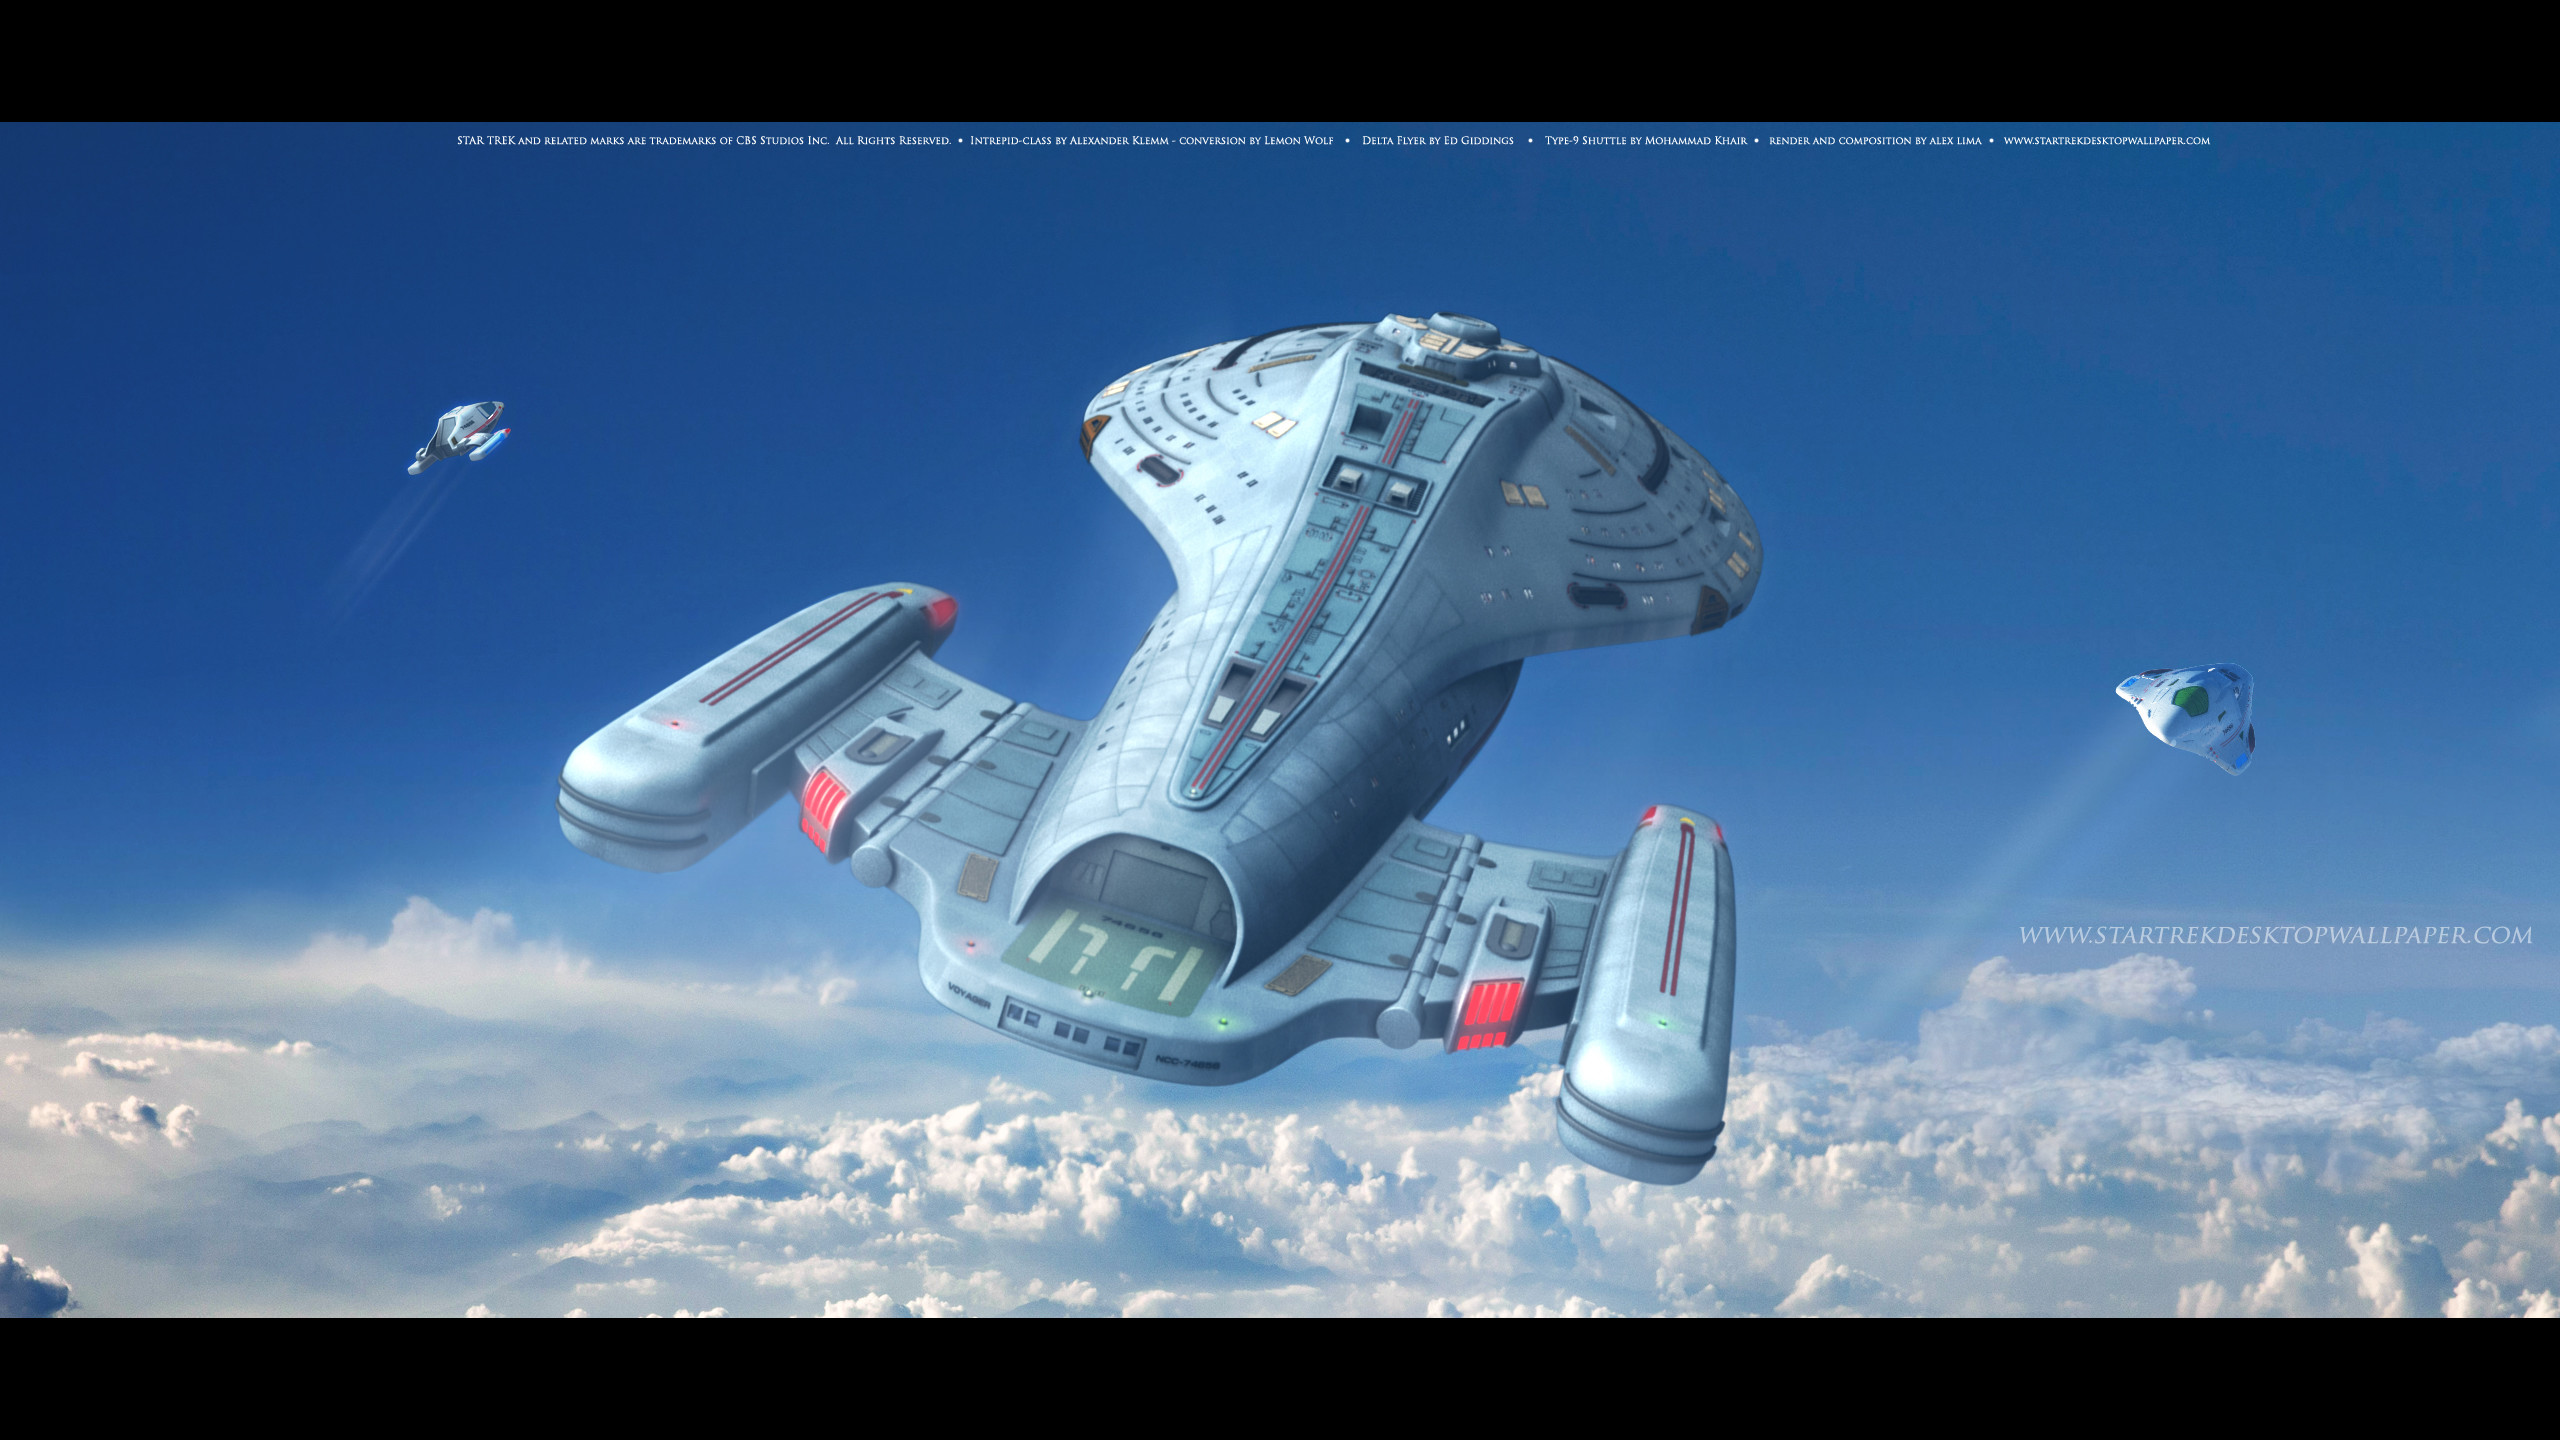 Star Trek Intrepid Class Starship USS Voyager Above The Clouds. Free Star  Trek computer desktop